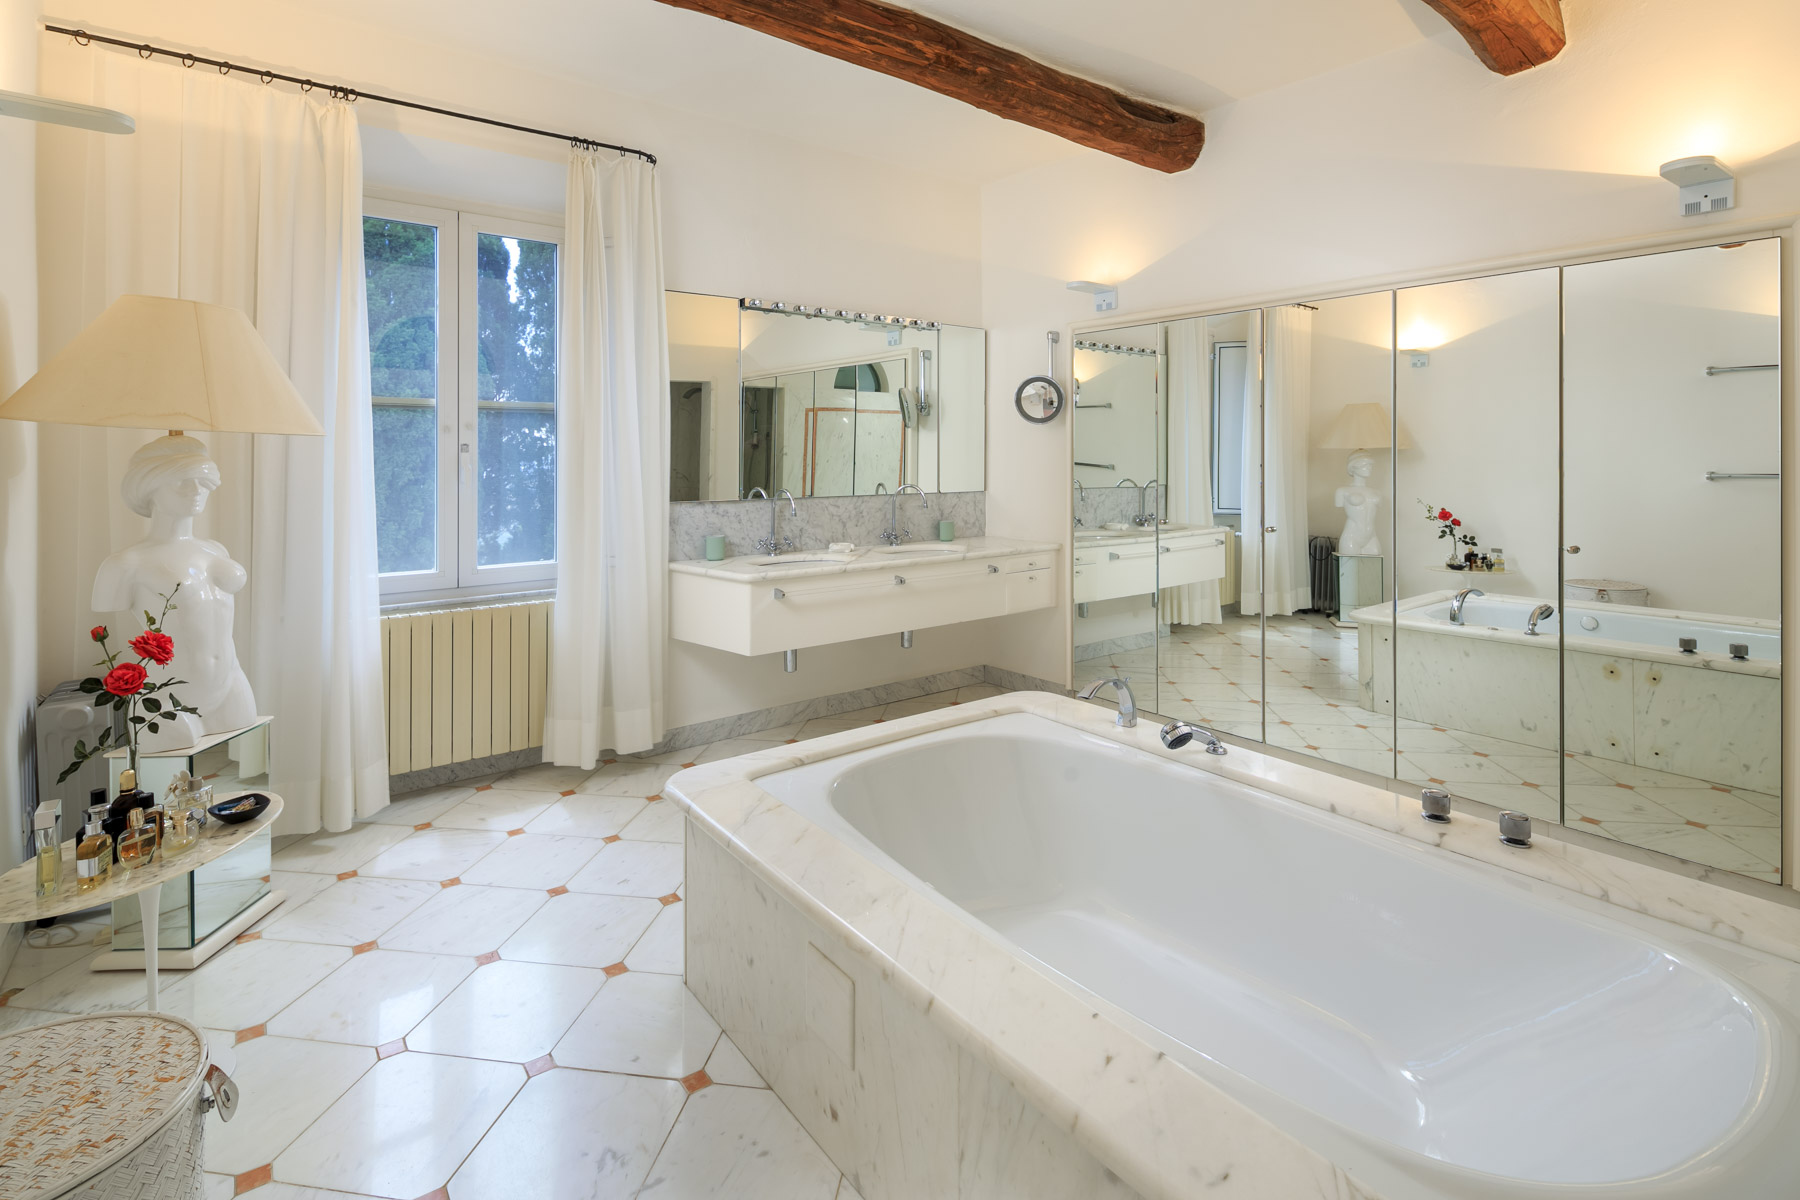 Villa in Vendita a Campiglia Marittima: 5 locali, 1100 mq - Foto 18